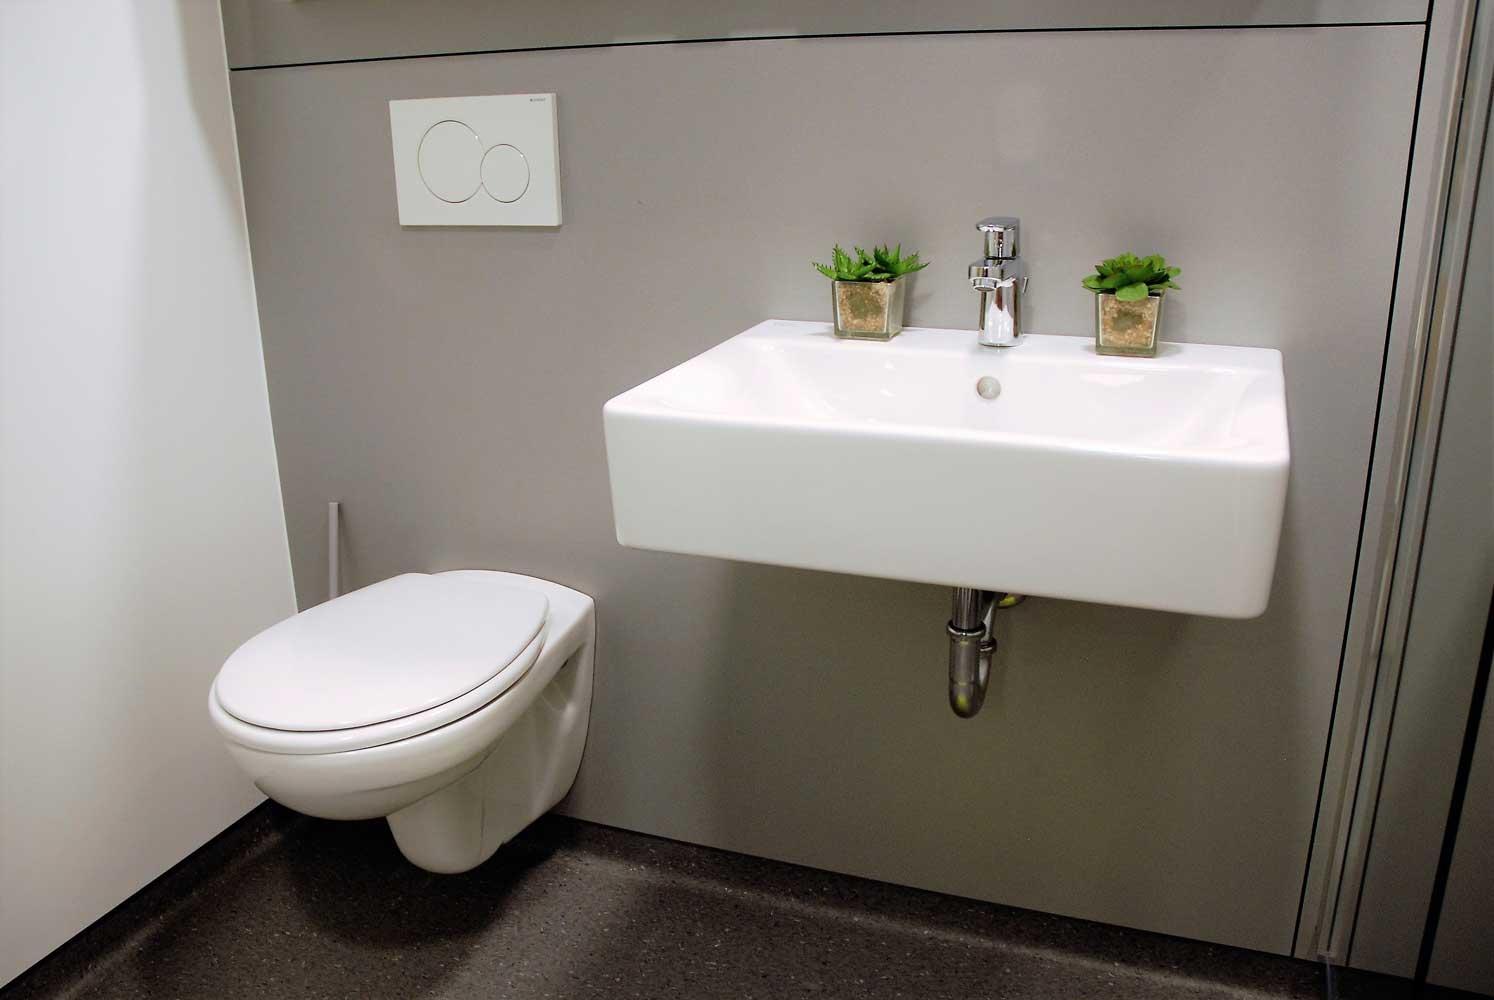 Toilet and sink - Johannes Kepler Heim